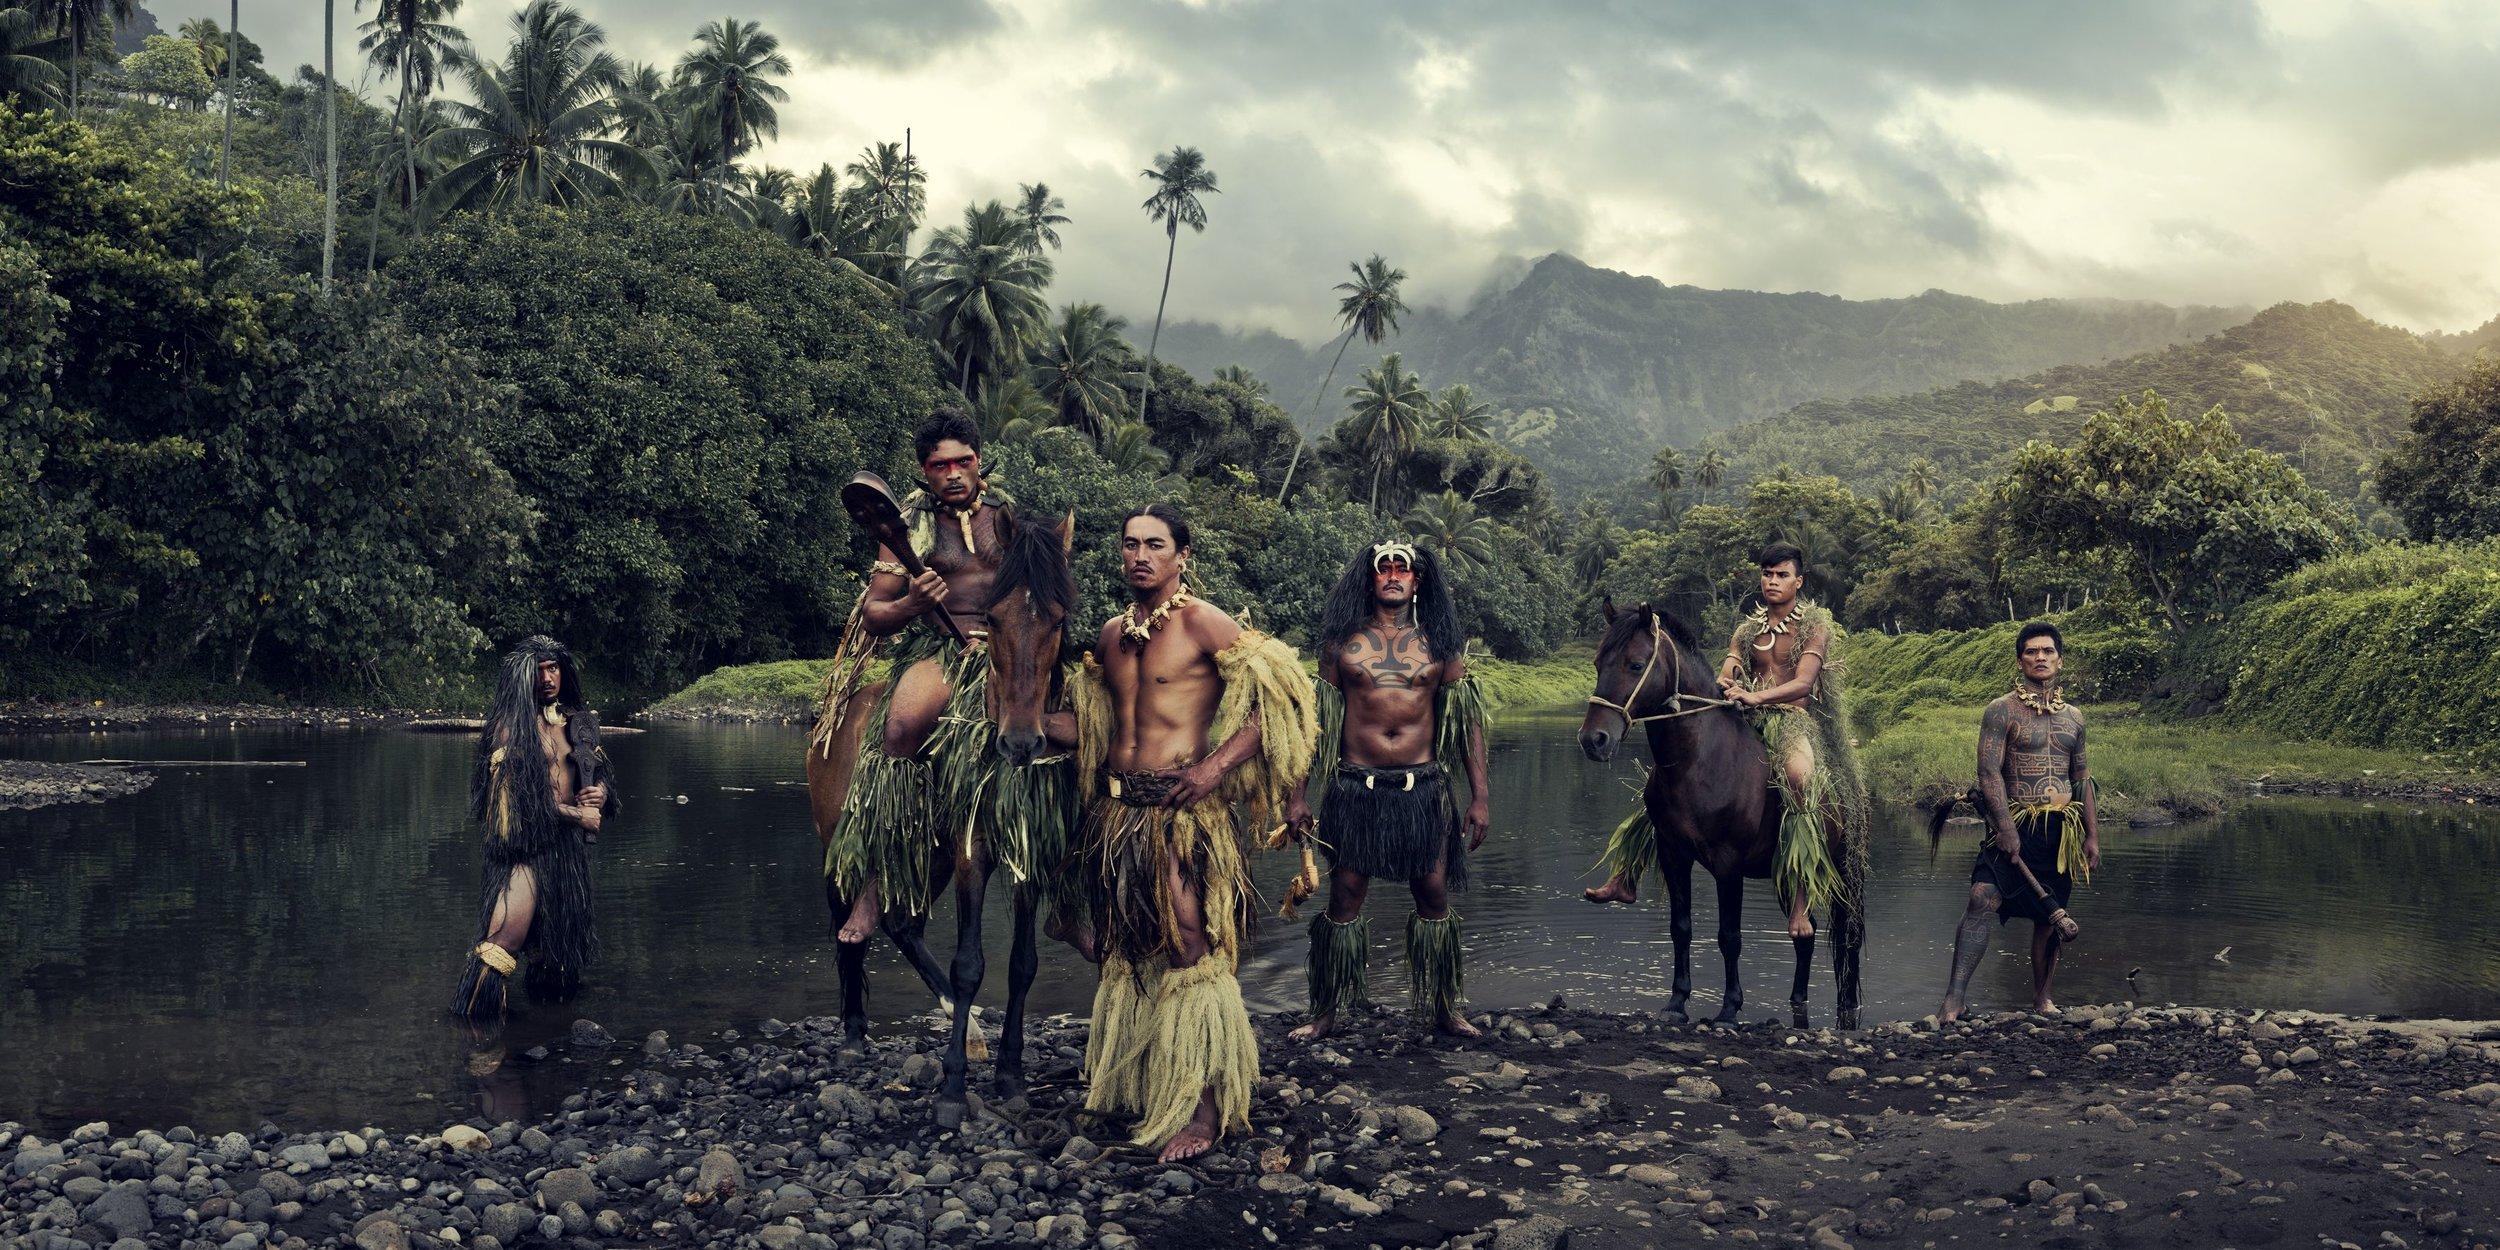 XXVI 16 - Vaioa River, Atuona, Hiva Oa, Marquesas Islands, 2016.jpg